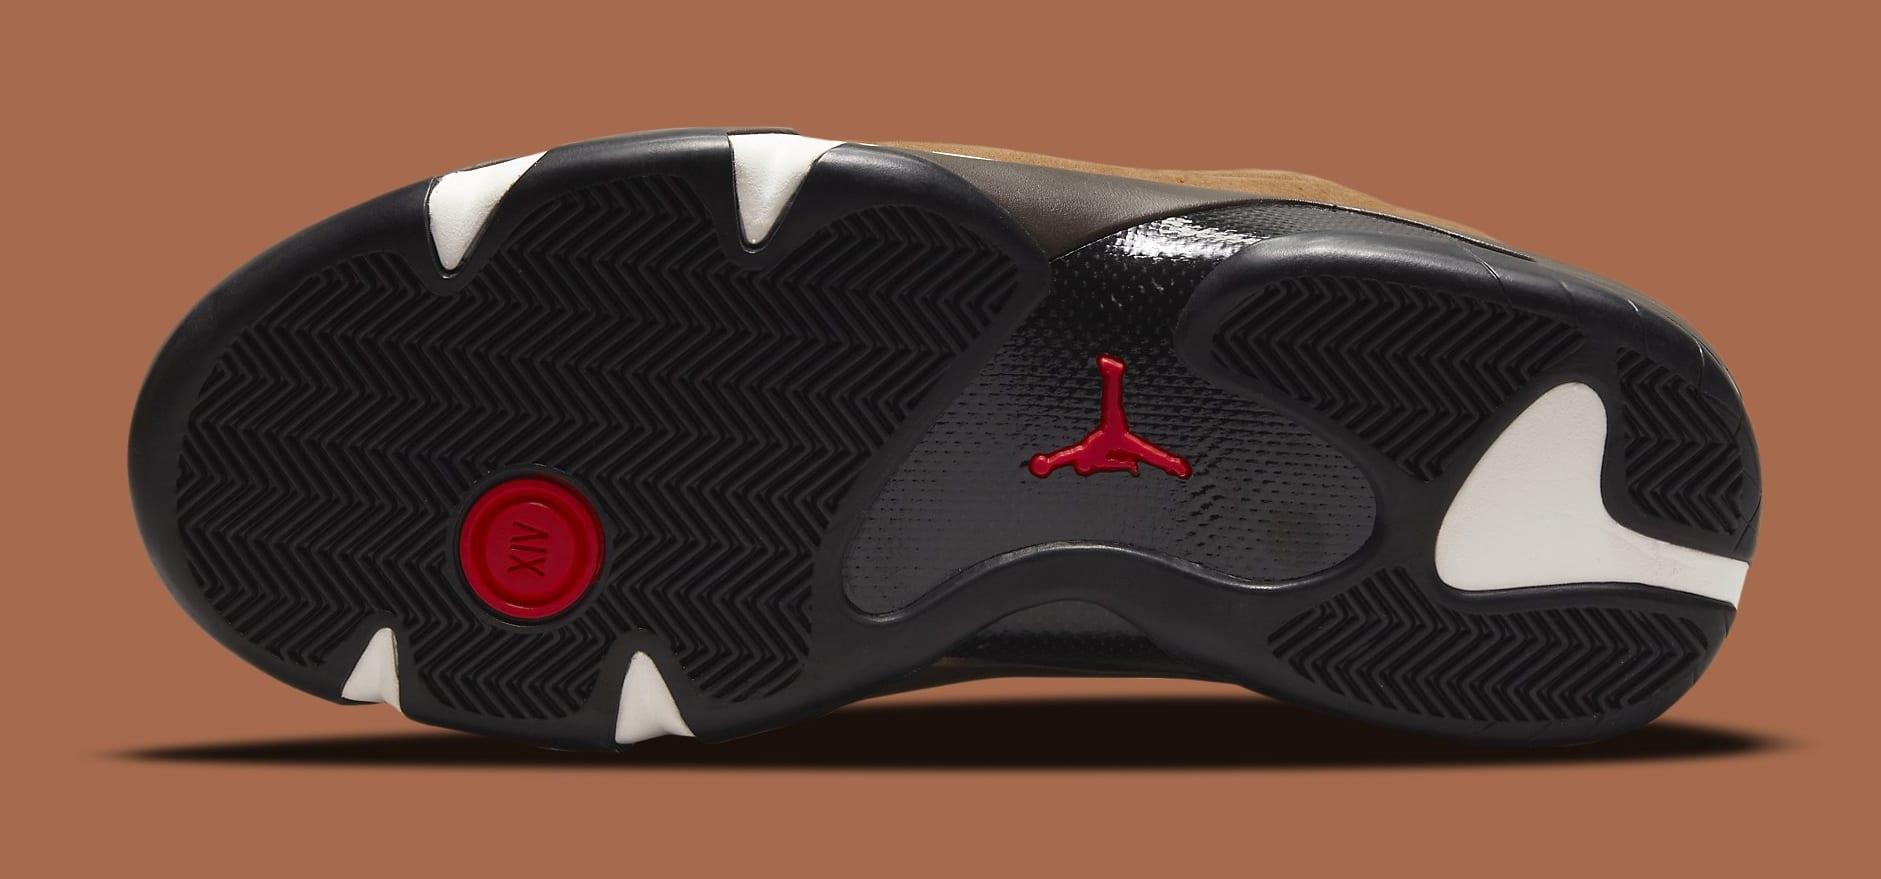 Air Jordan 14 'Winterized' DO9406 200 Outsole